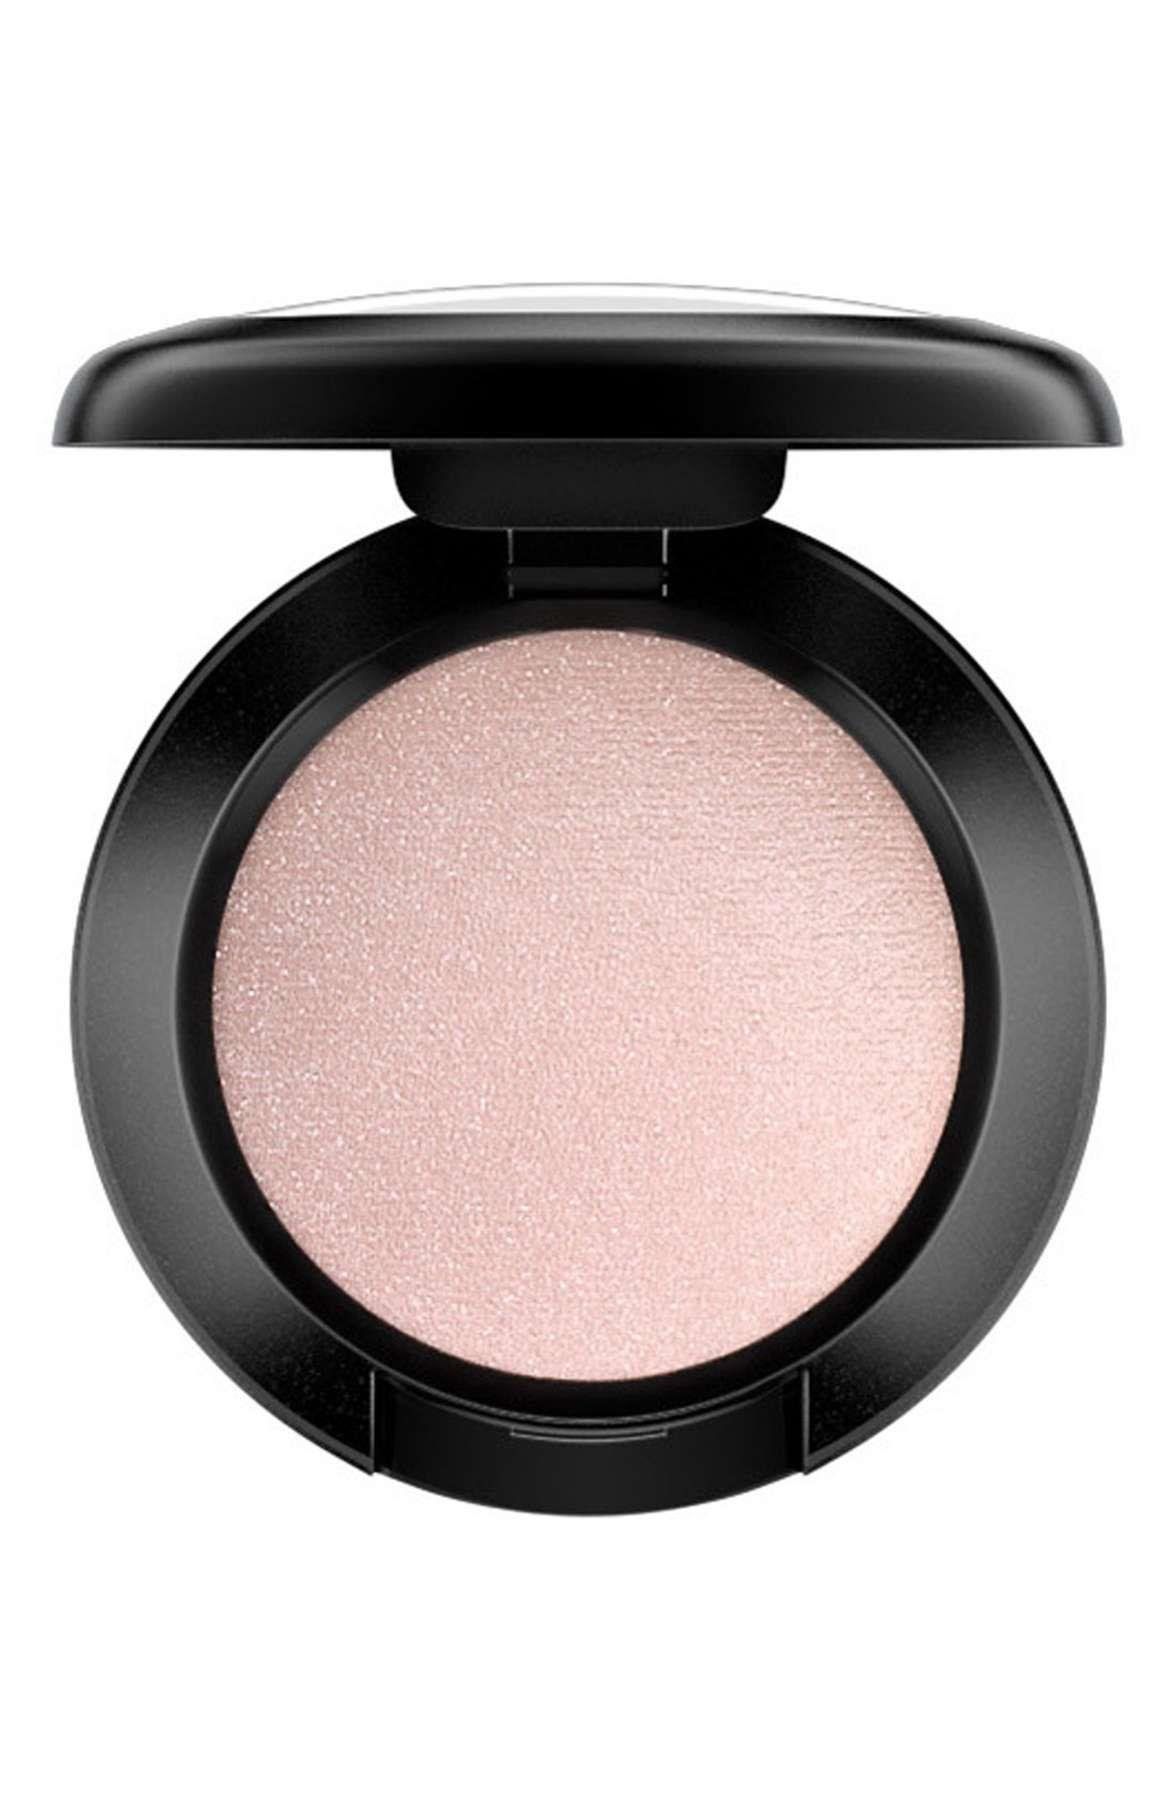 Eyeshadow Mac cosmetics eyeshadow, Mac eyeshadow, Purple